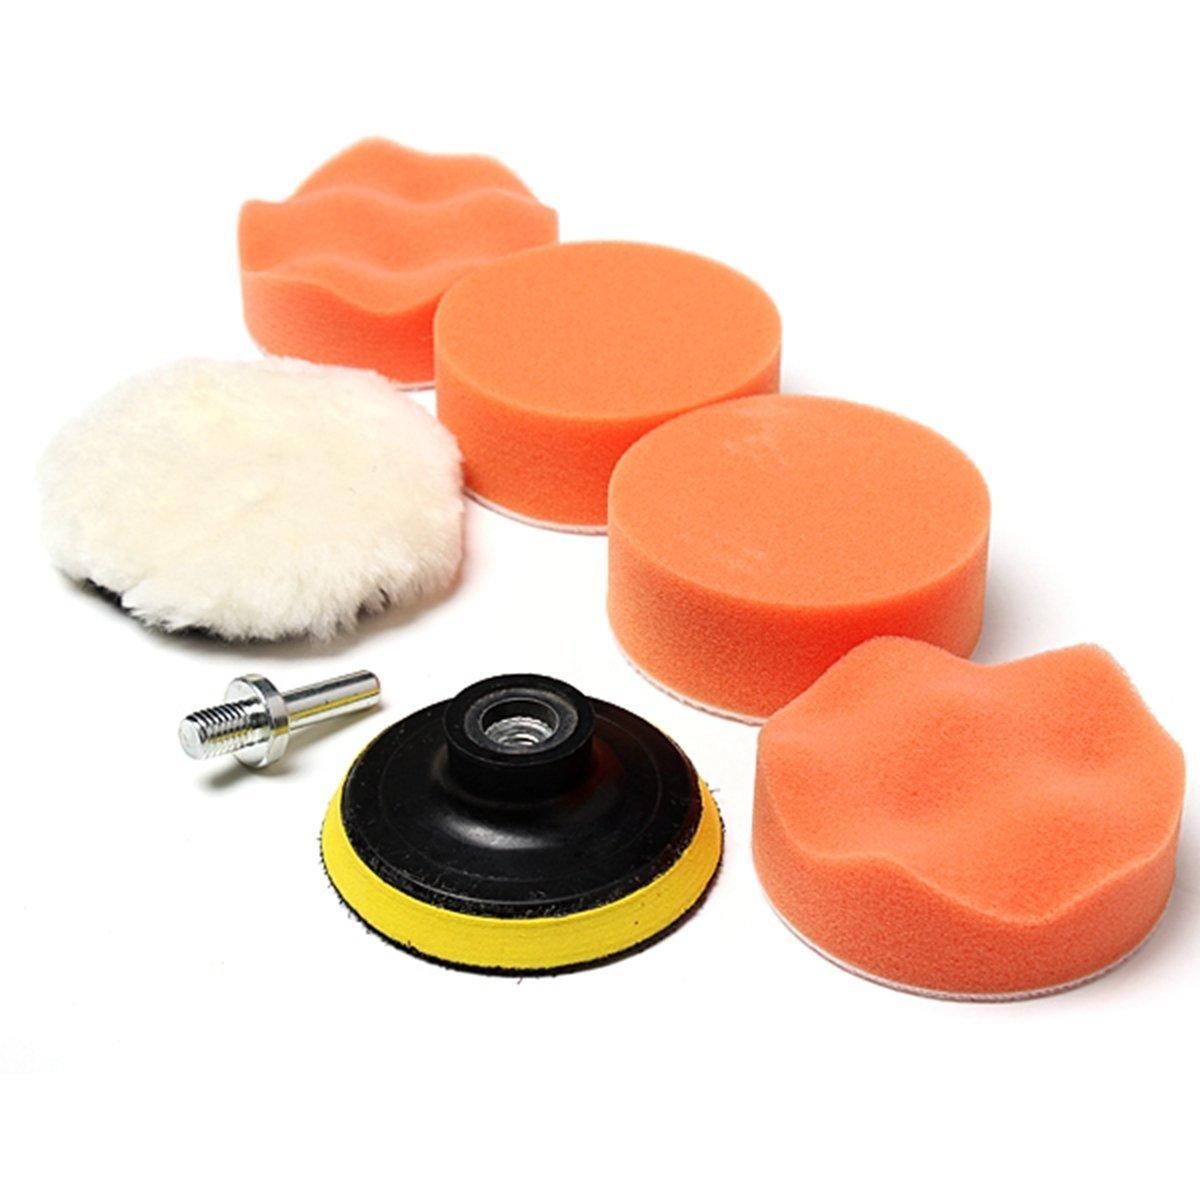 MAXGOODS 3' Foam Buffing Polishing Pads with Drill Adapter for Car Sanding Polishing Buffing